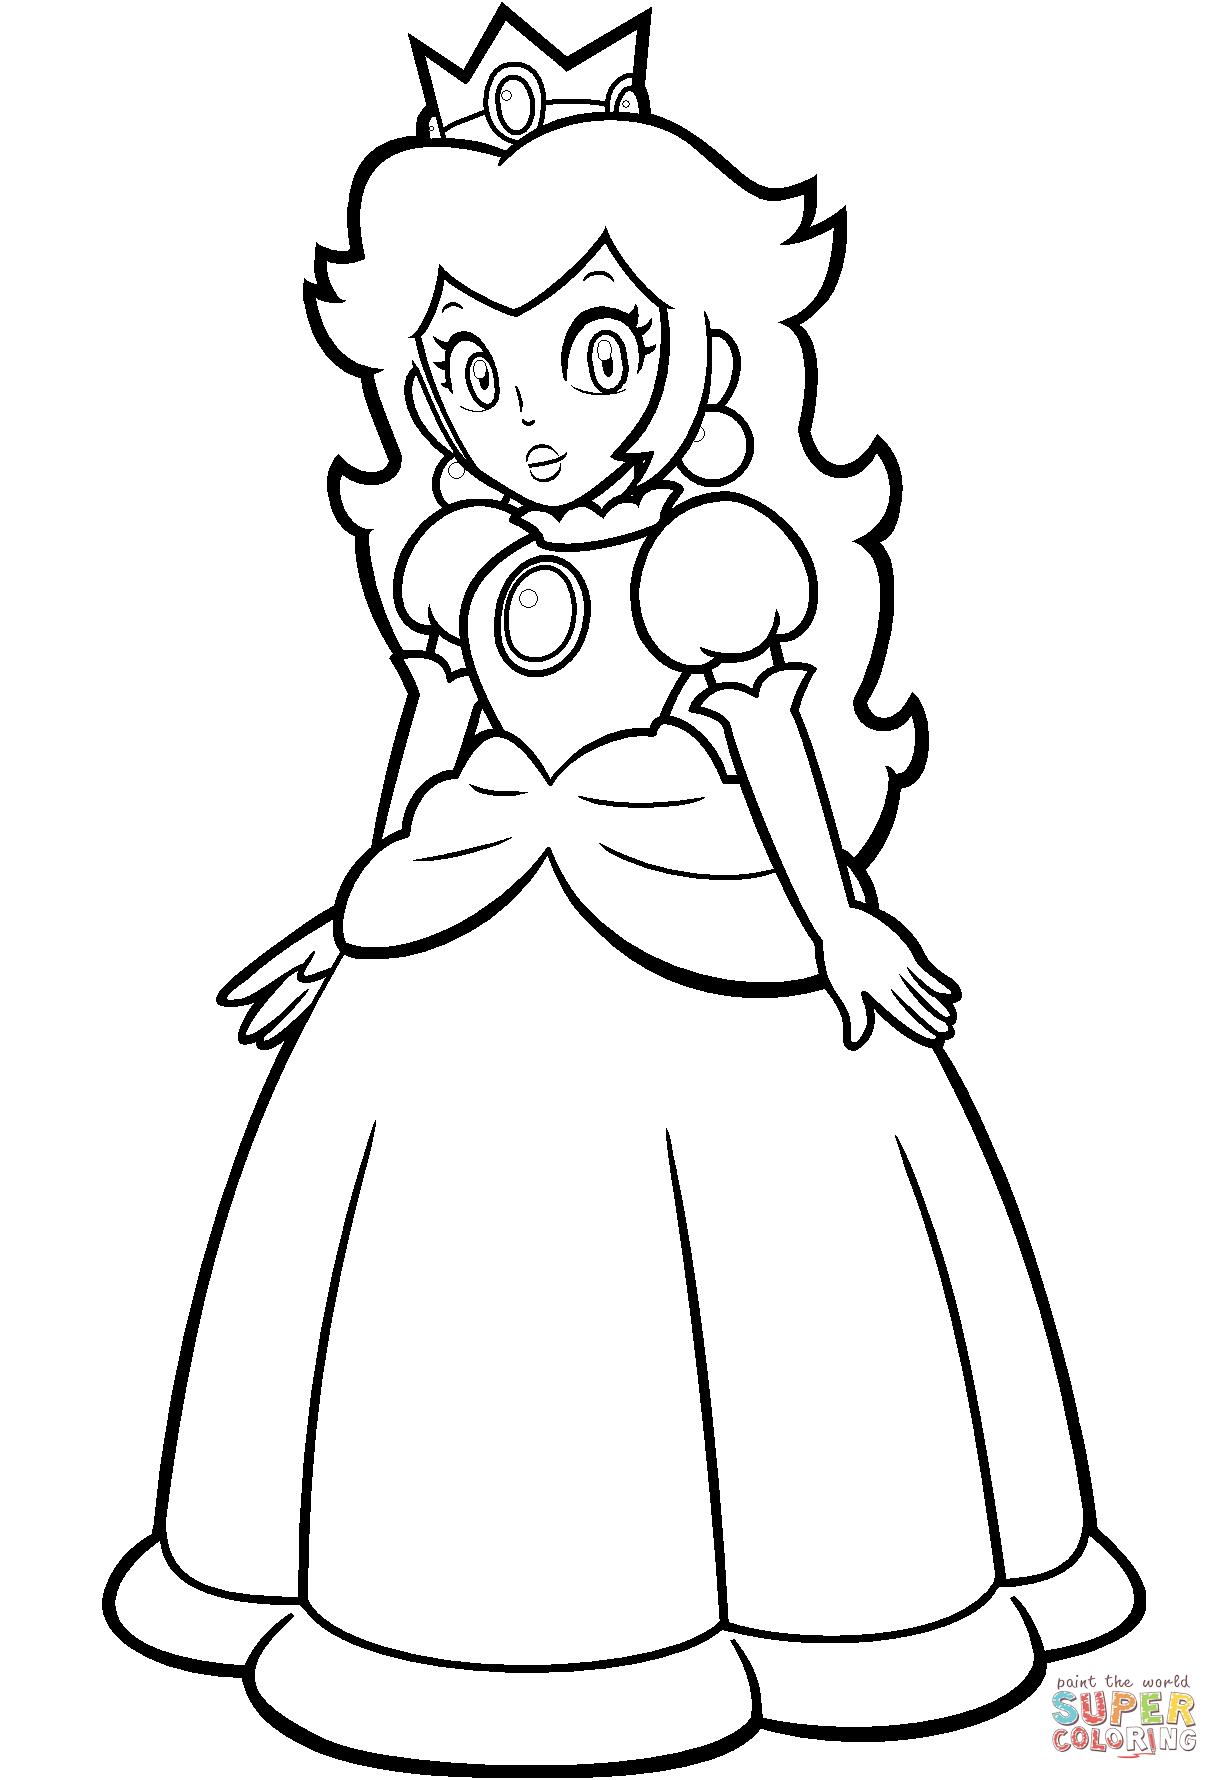 1220x1780 Mario Princess Peach Coloring Page Free Printable Pages